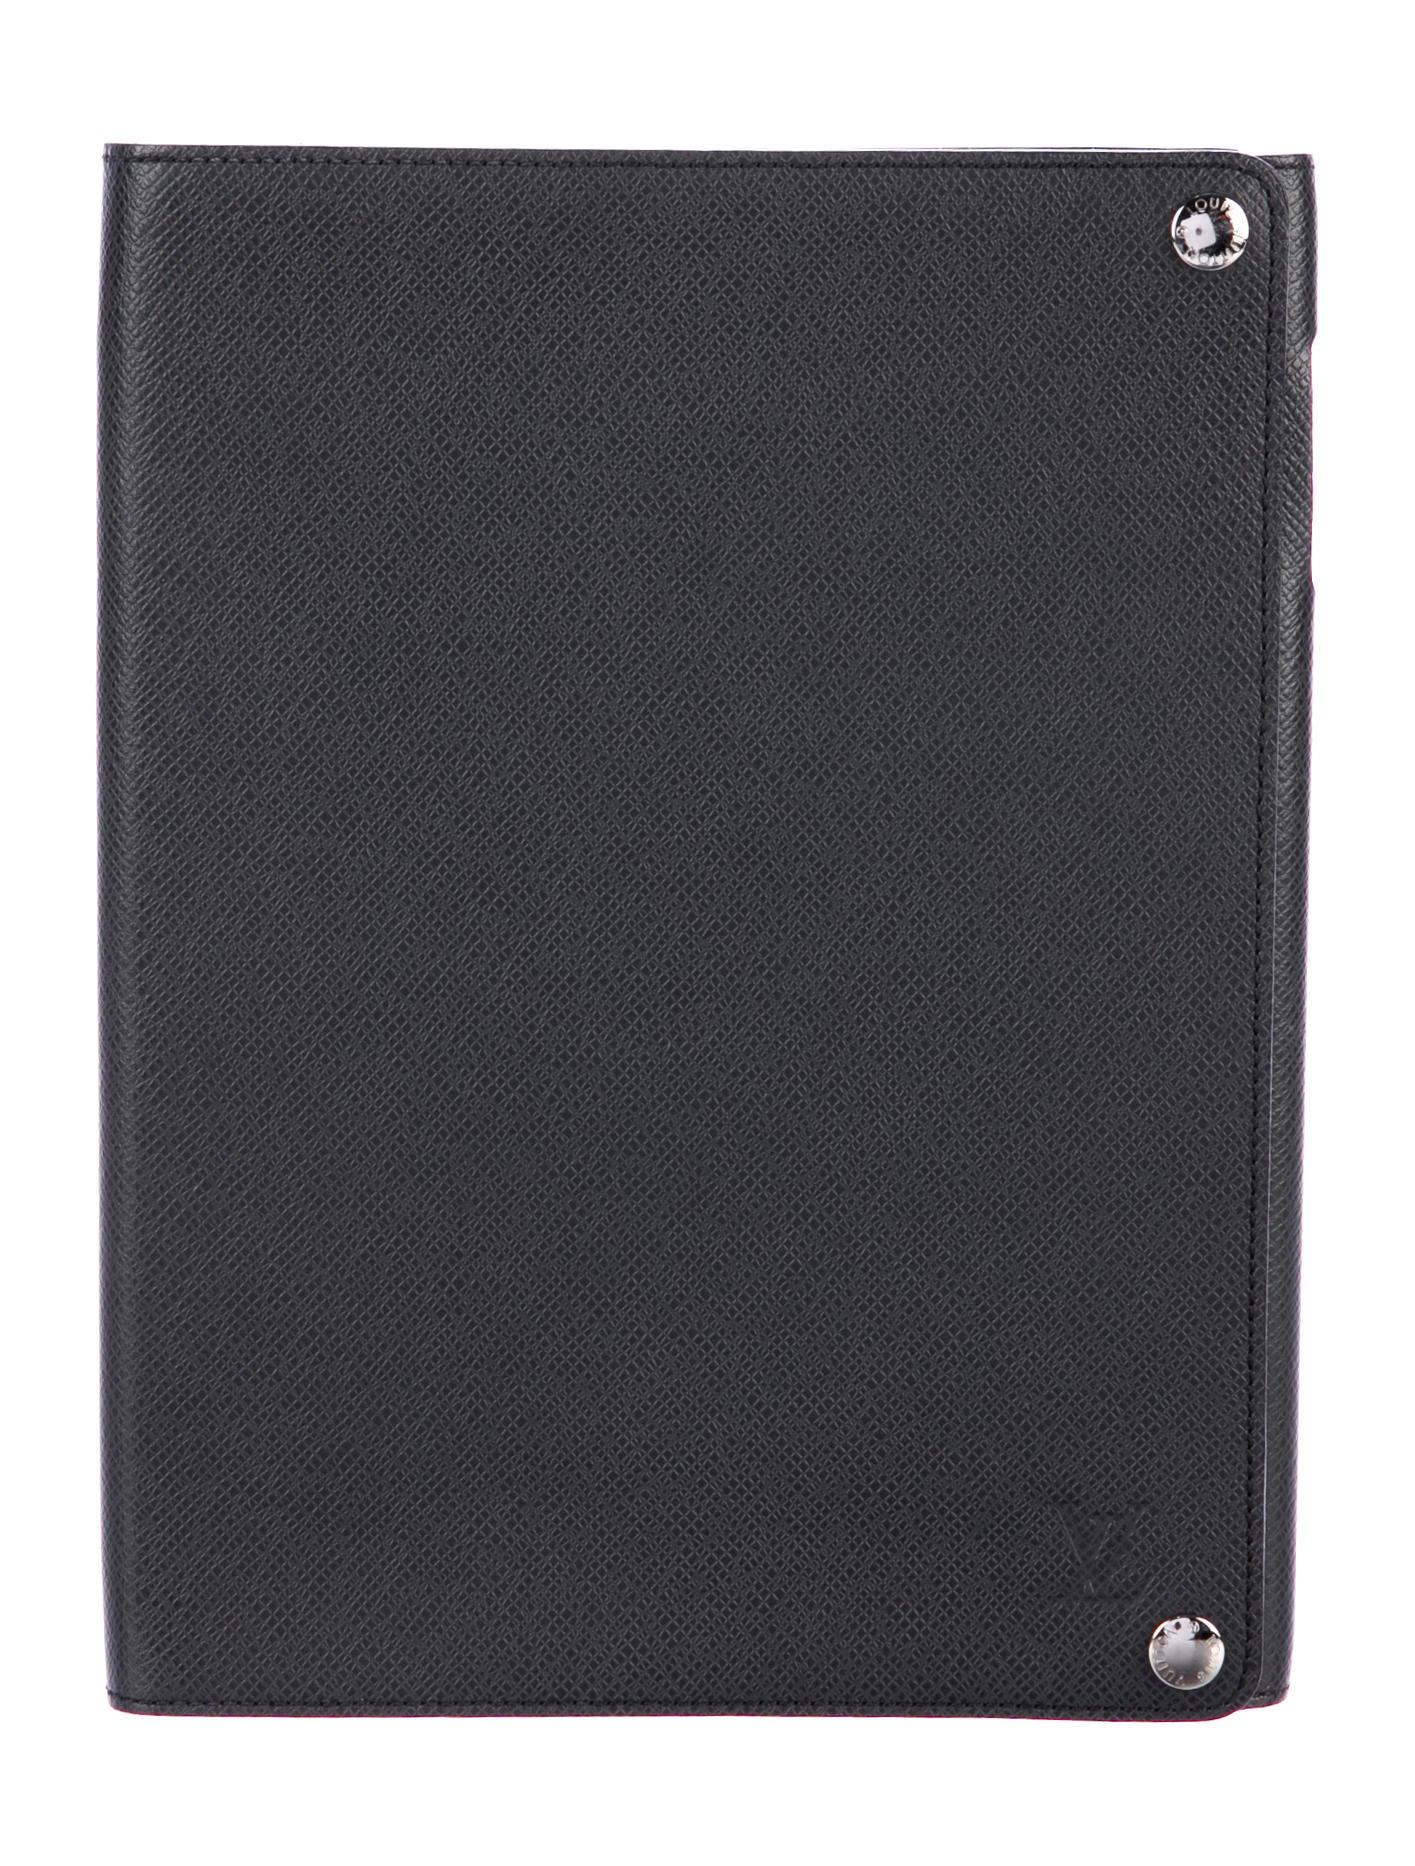 Louis Vuitton Taiga Ipad Case Technology Lou131046